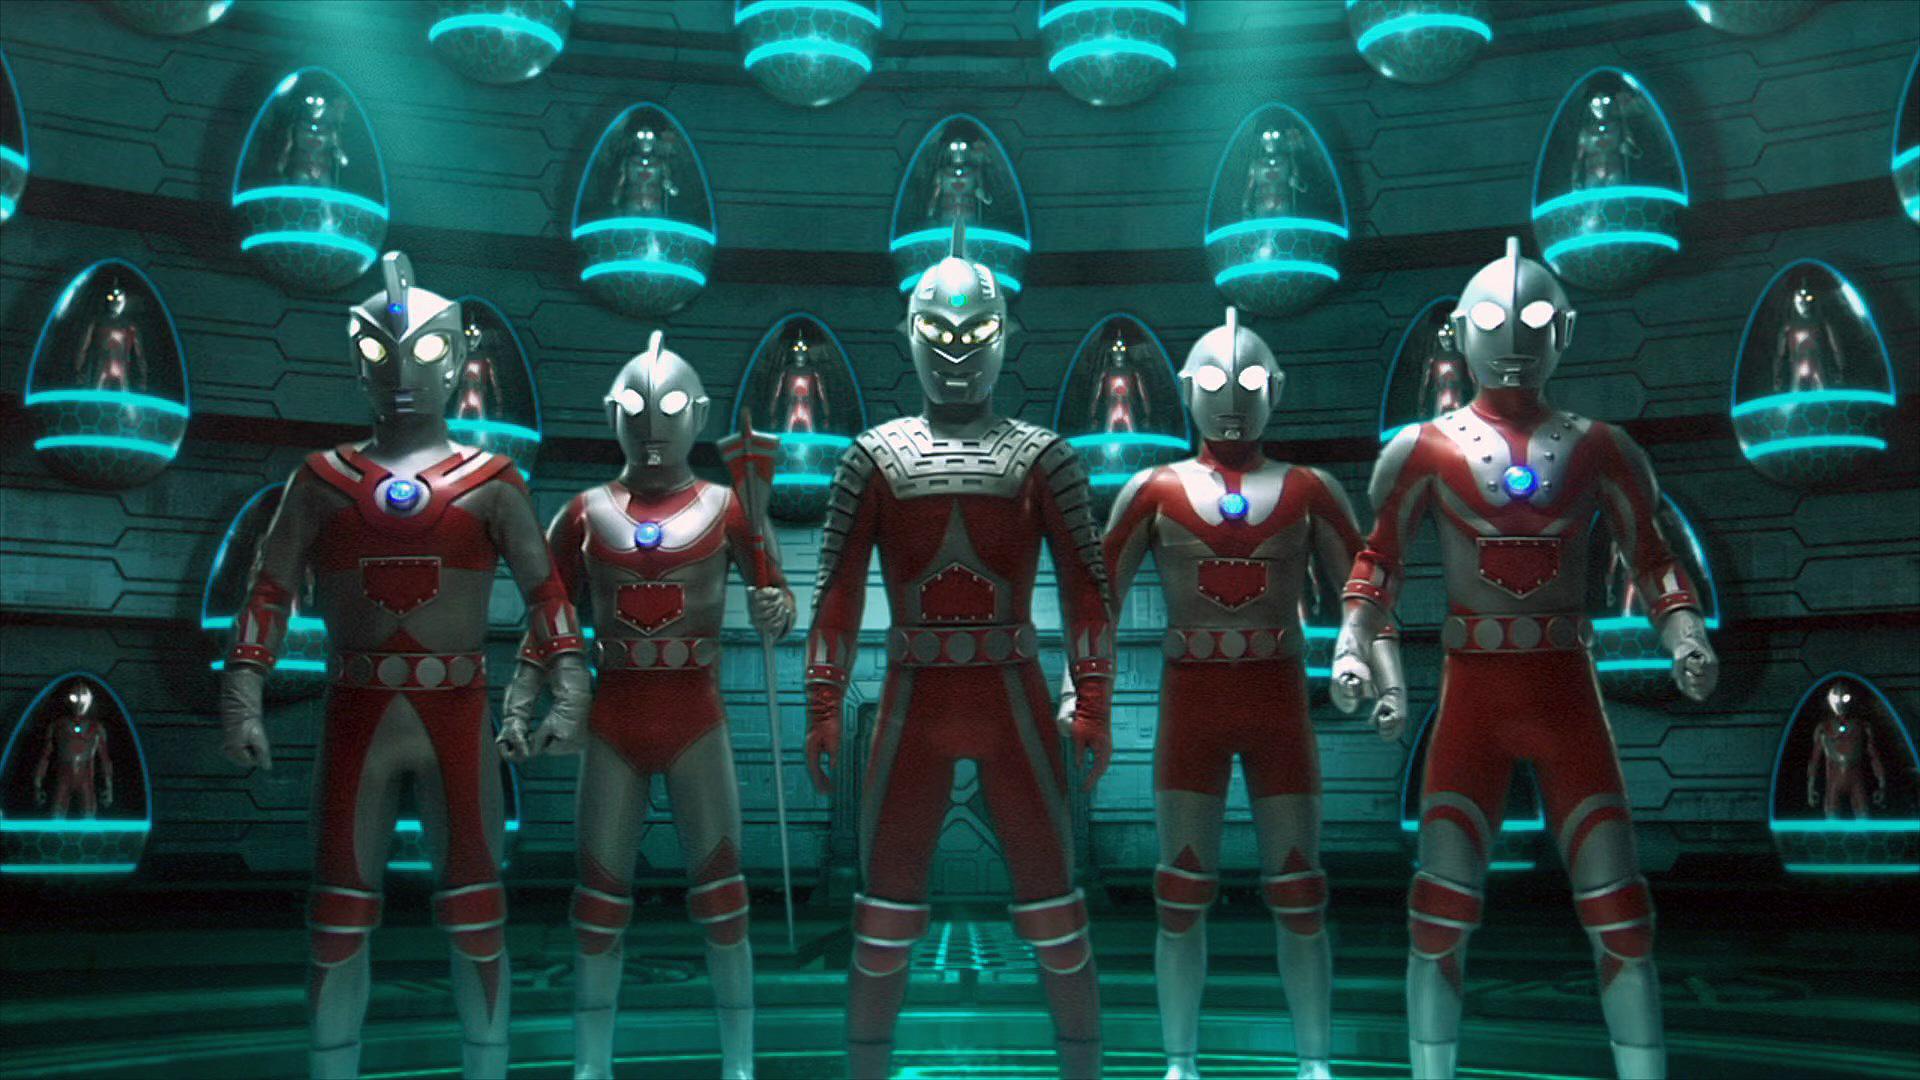 Imitation Ultra Brothers (SR Team)